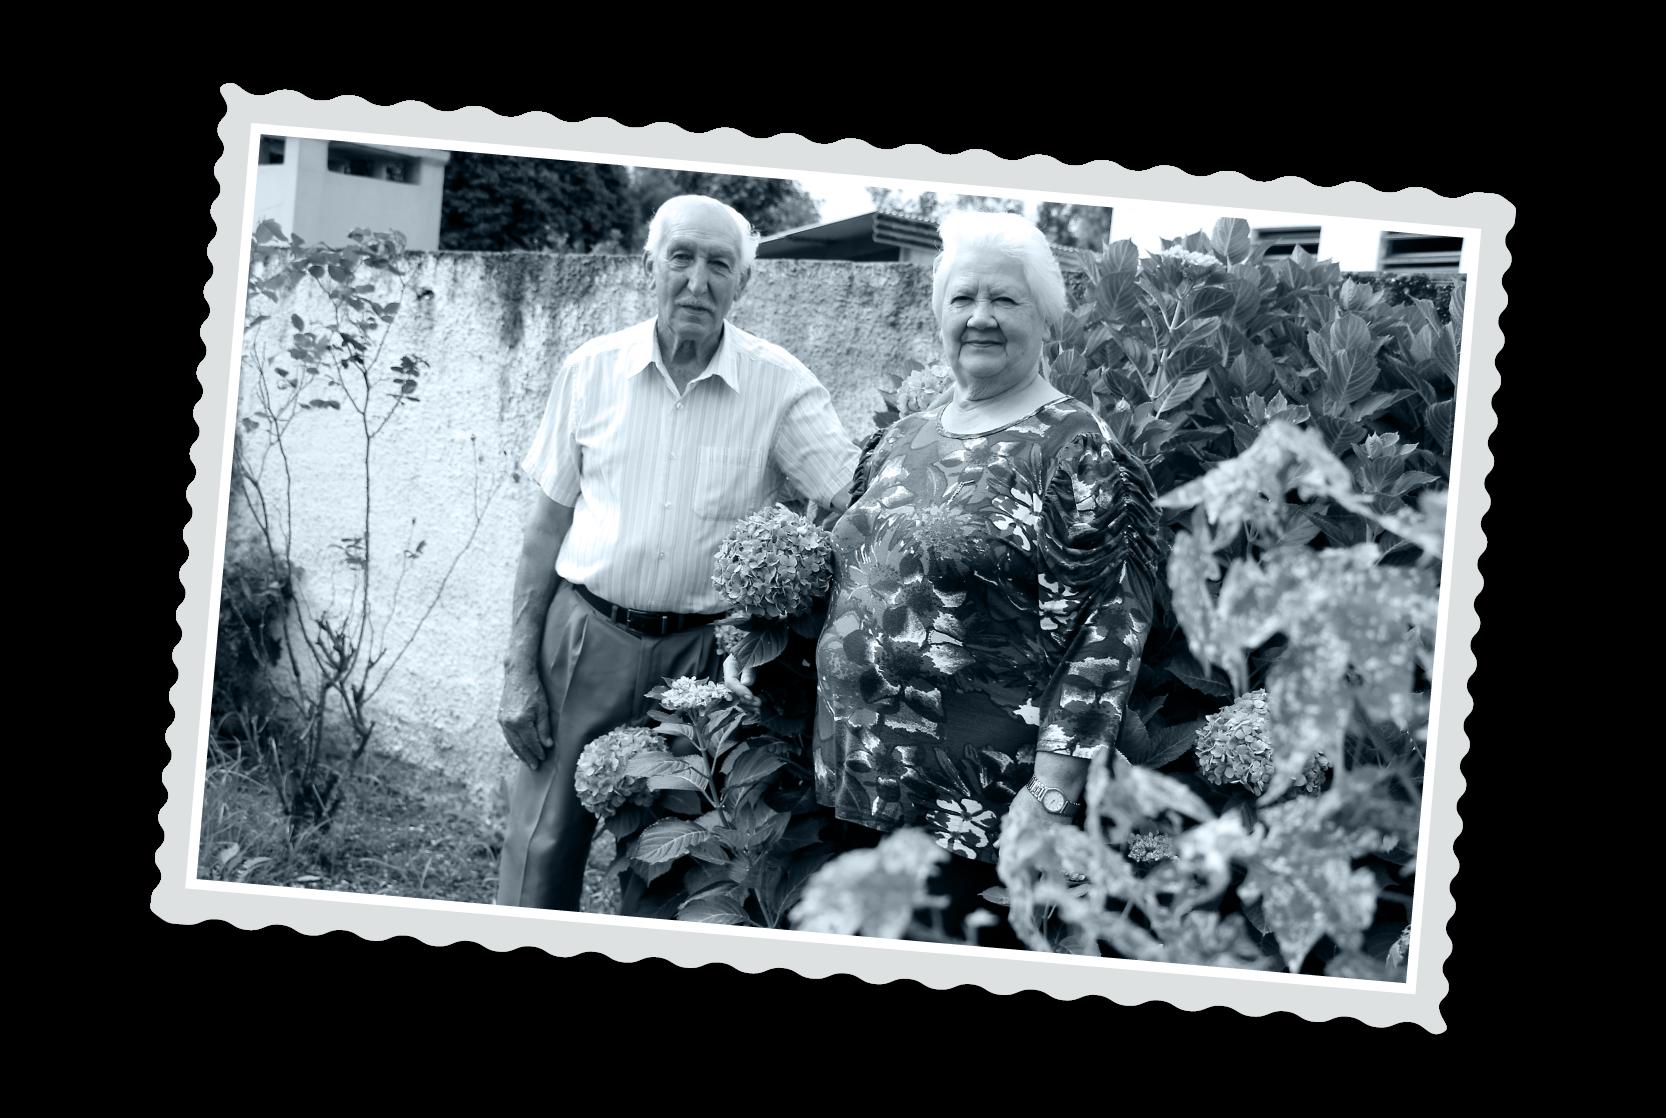 Maria Vilma e Ubaldo Paolin